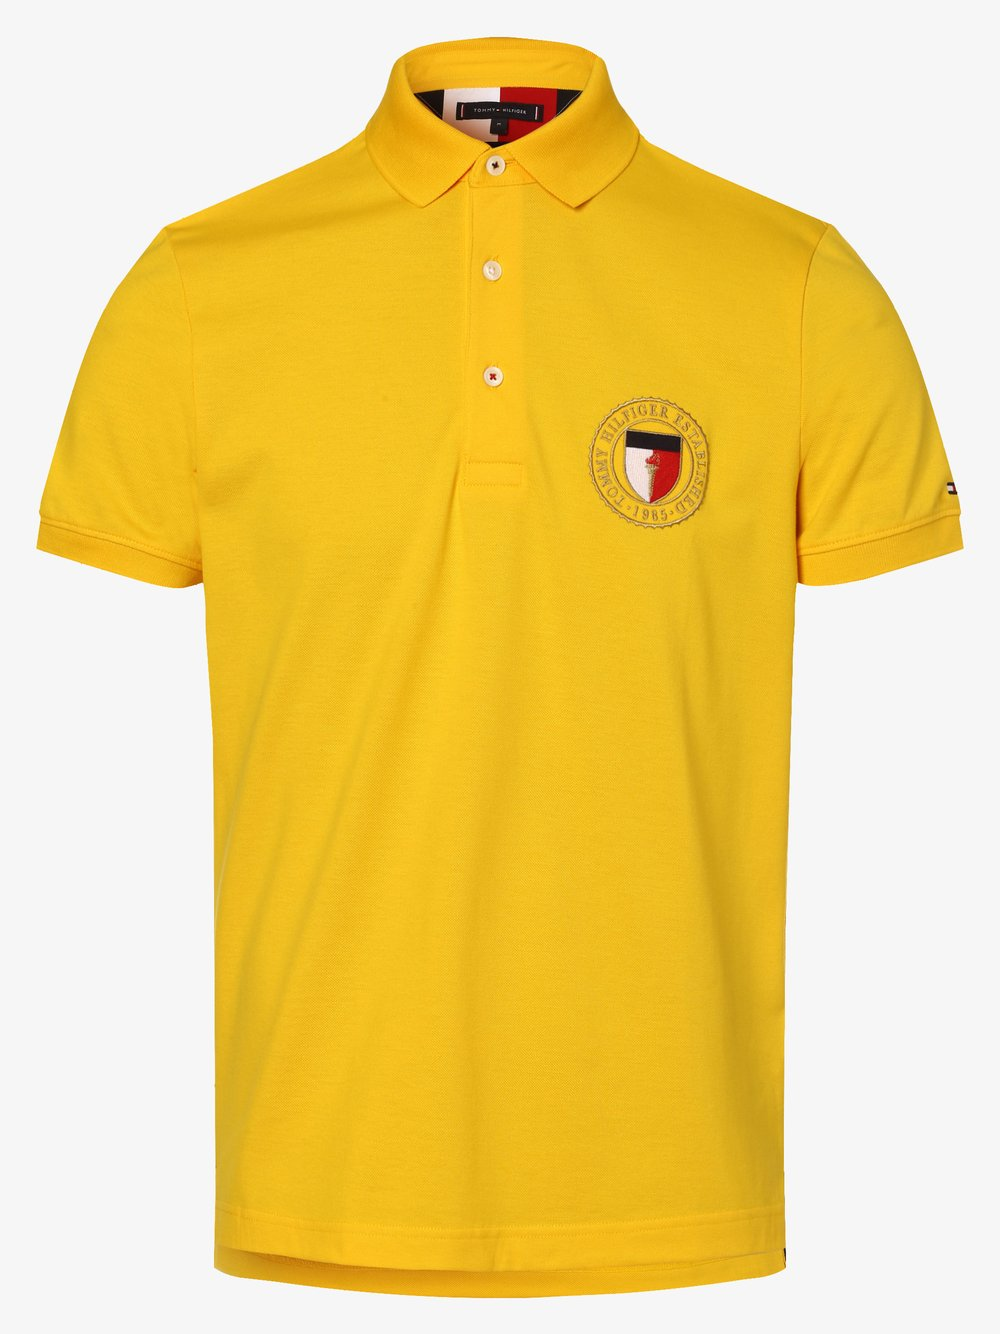 Tommy Hilfiger - Męska koszulka polo, żółty